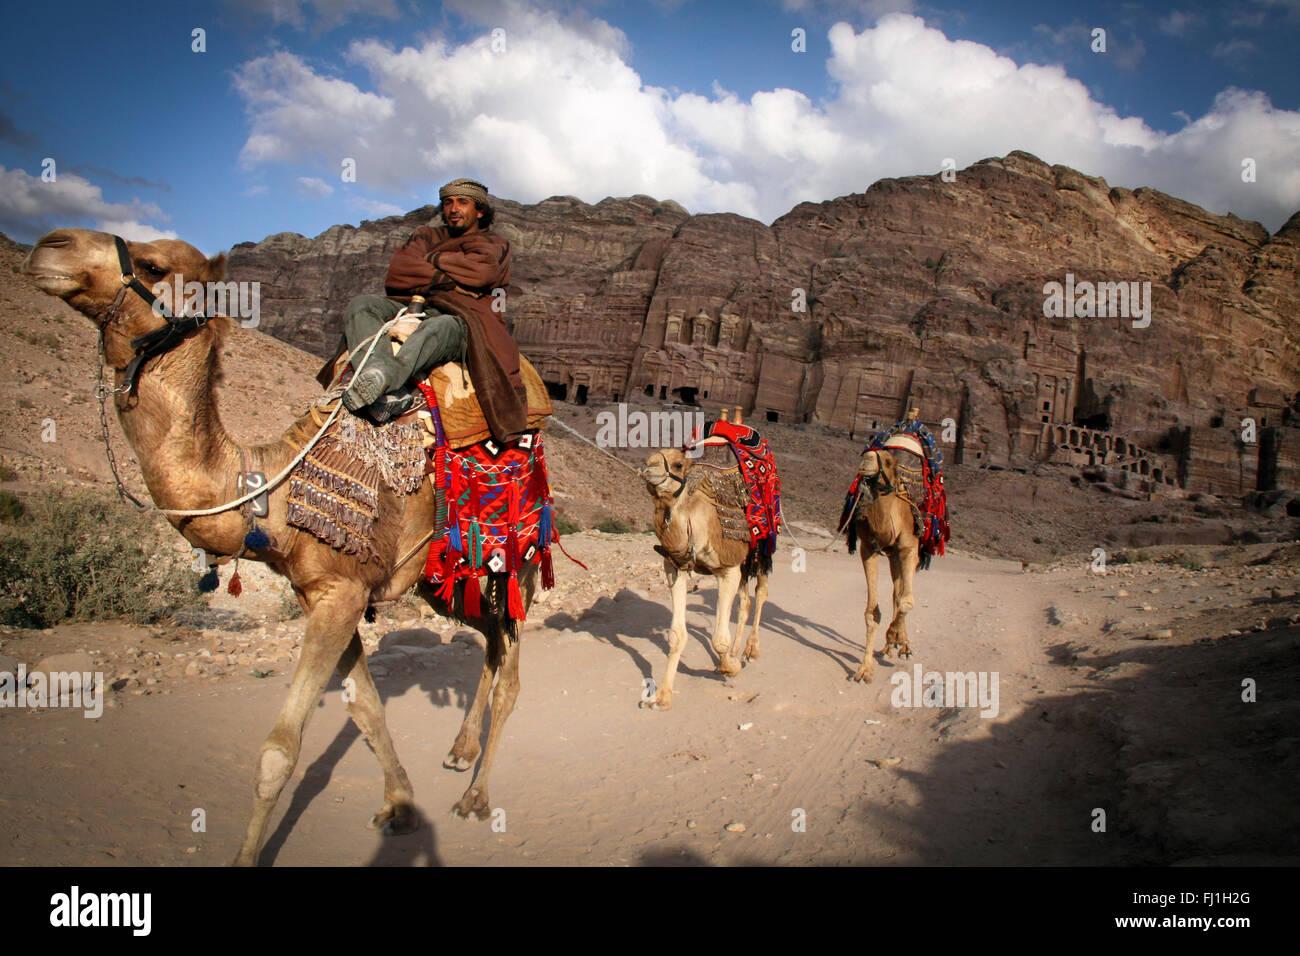 Petra, Jordania - paisaje y gente beduin Imagen De Stock